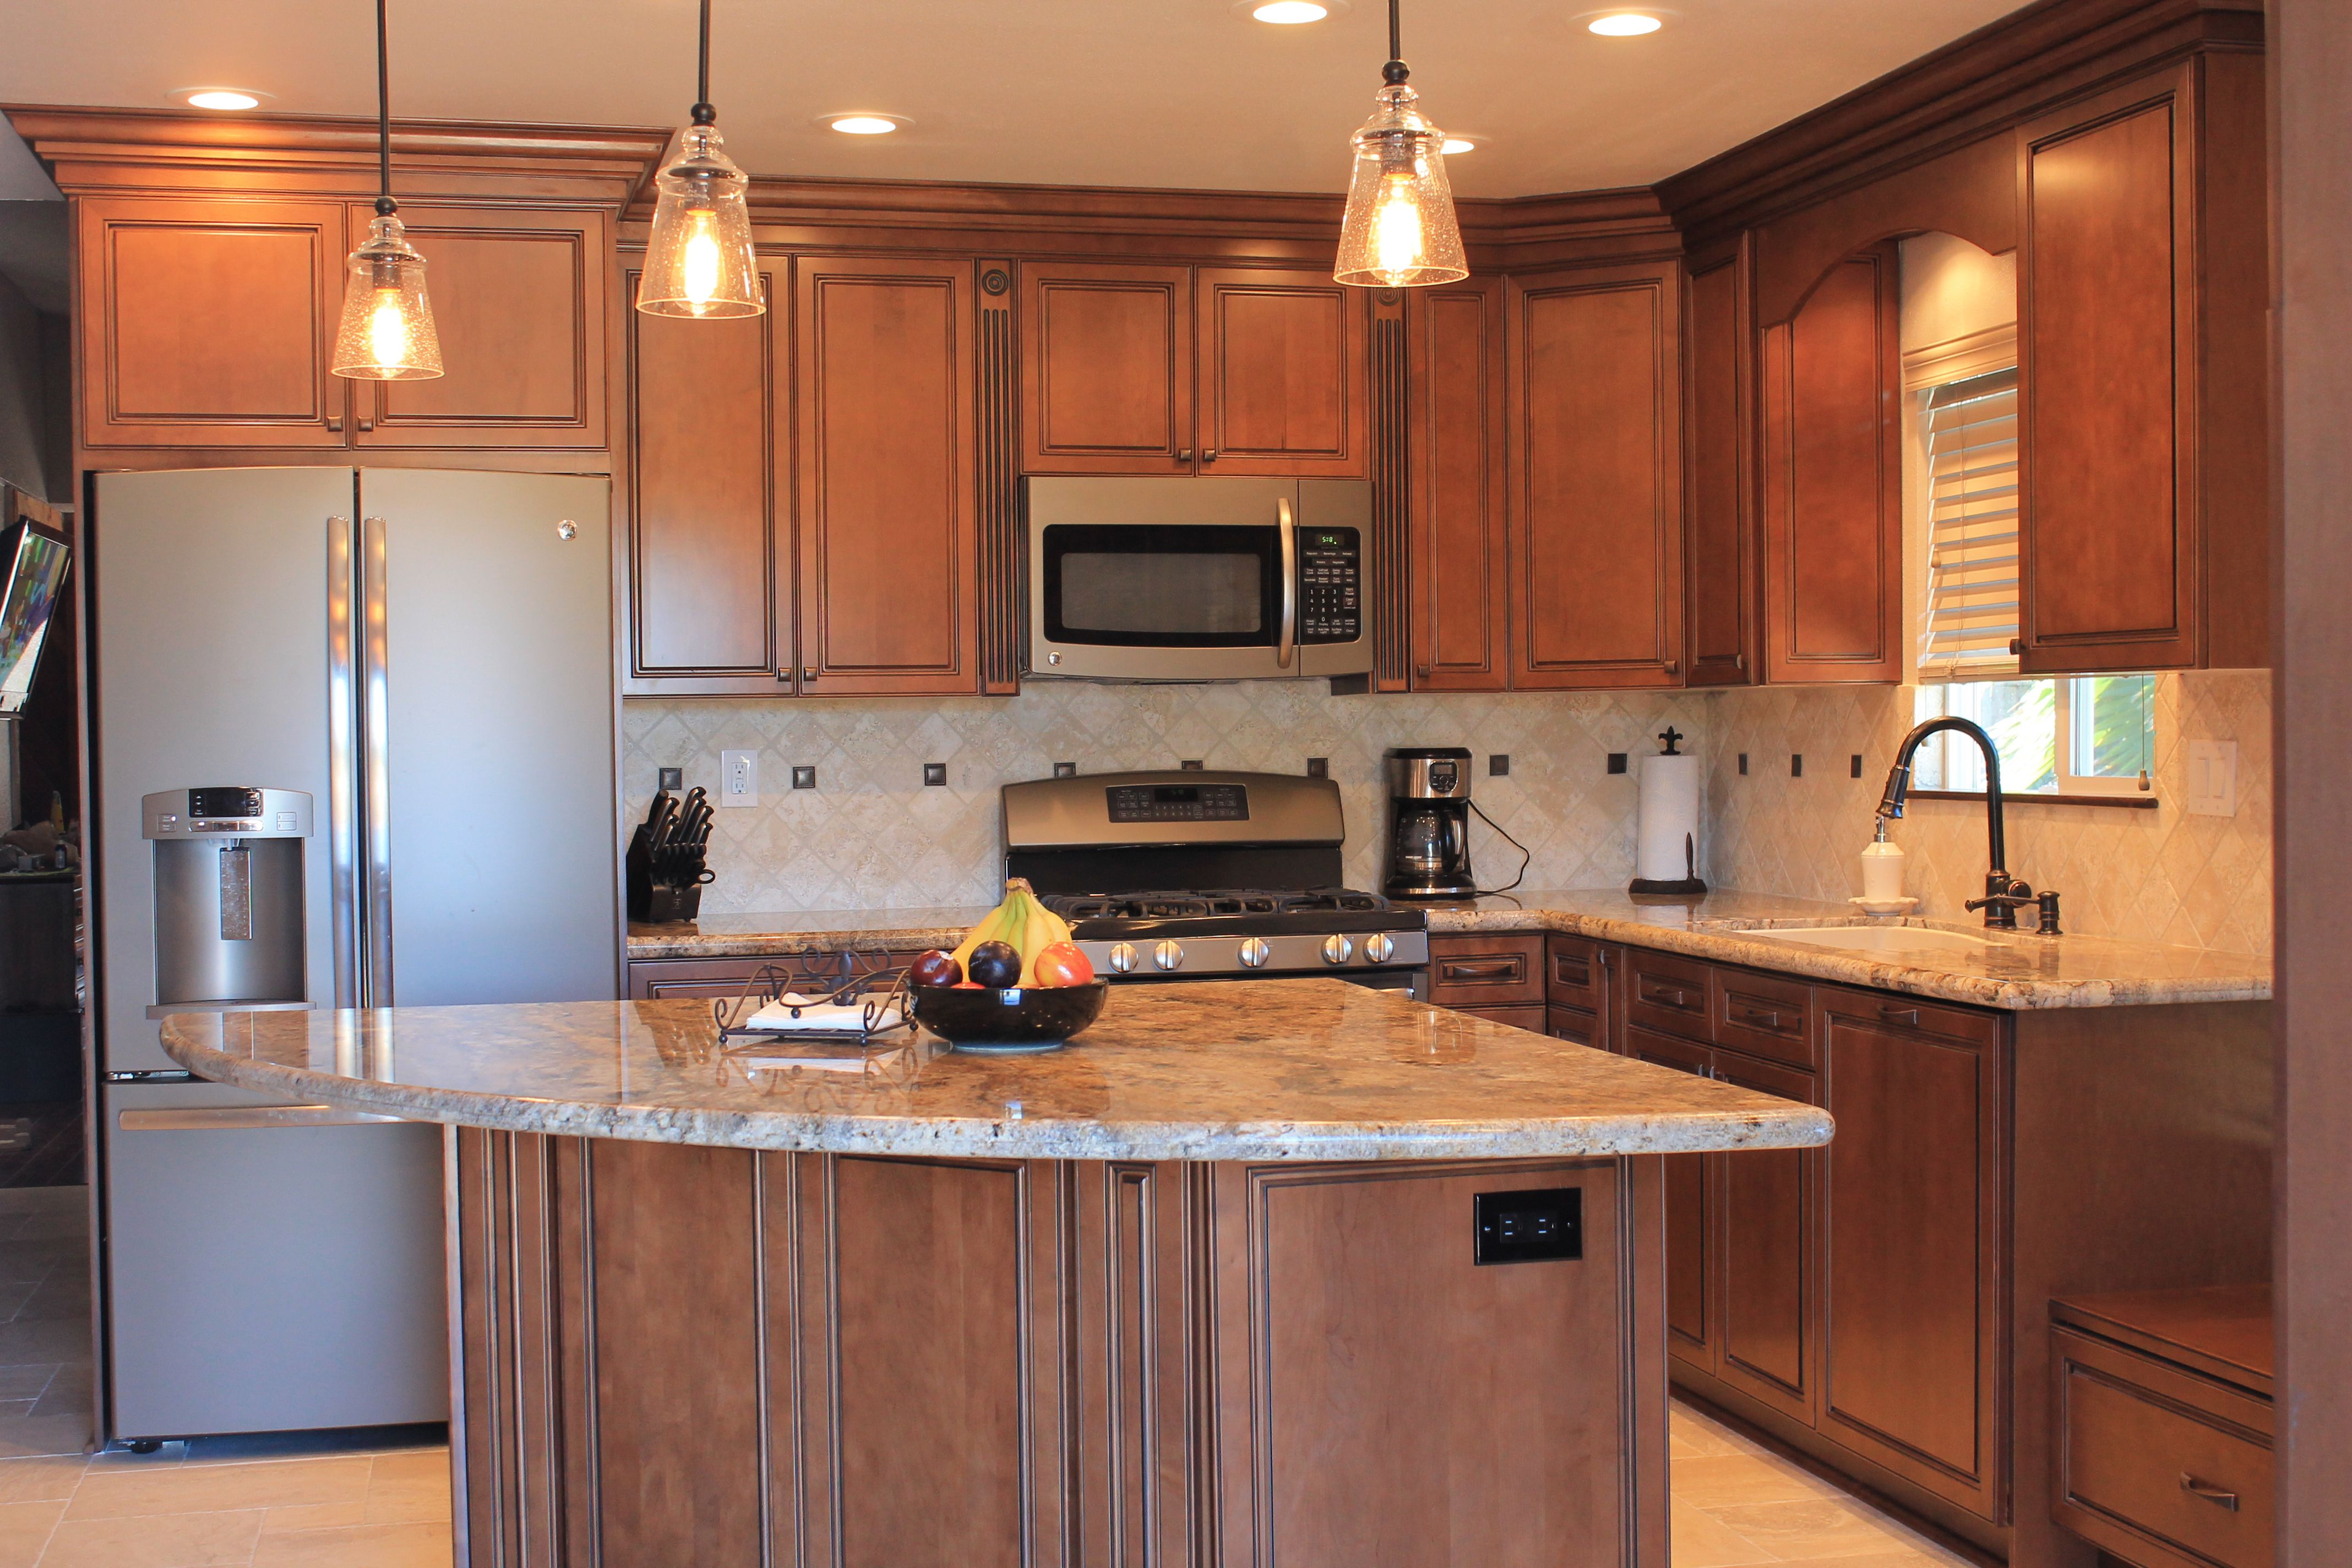 Quarter Circle Kitchen Island With Back Storage Cabinet Ge Slate Appliances Bo Slate Appliances Kitchen Interior Design Kitchen Contemporary Slate Appliances